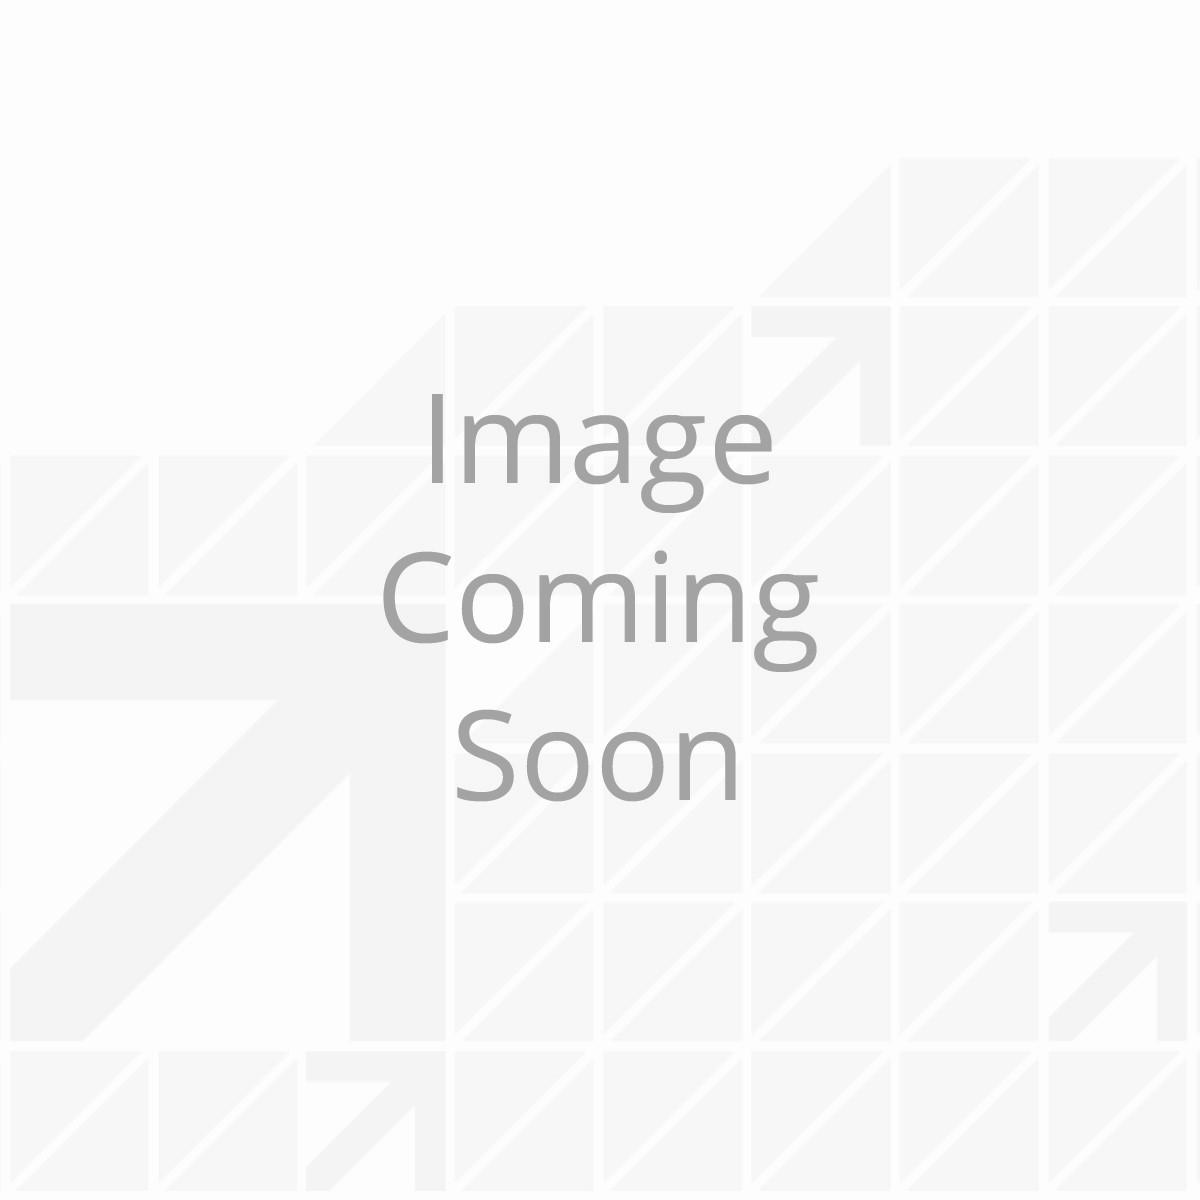 359413_-_pg_leveling_service_kit_-_001_1